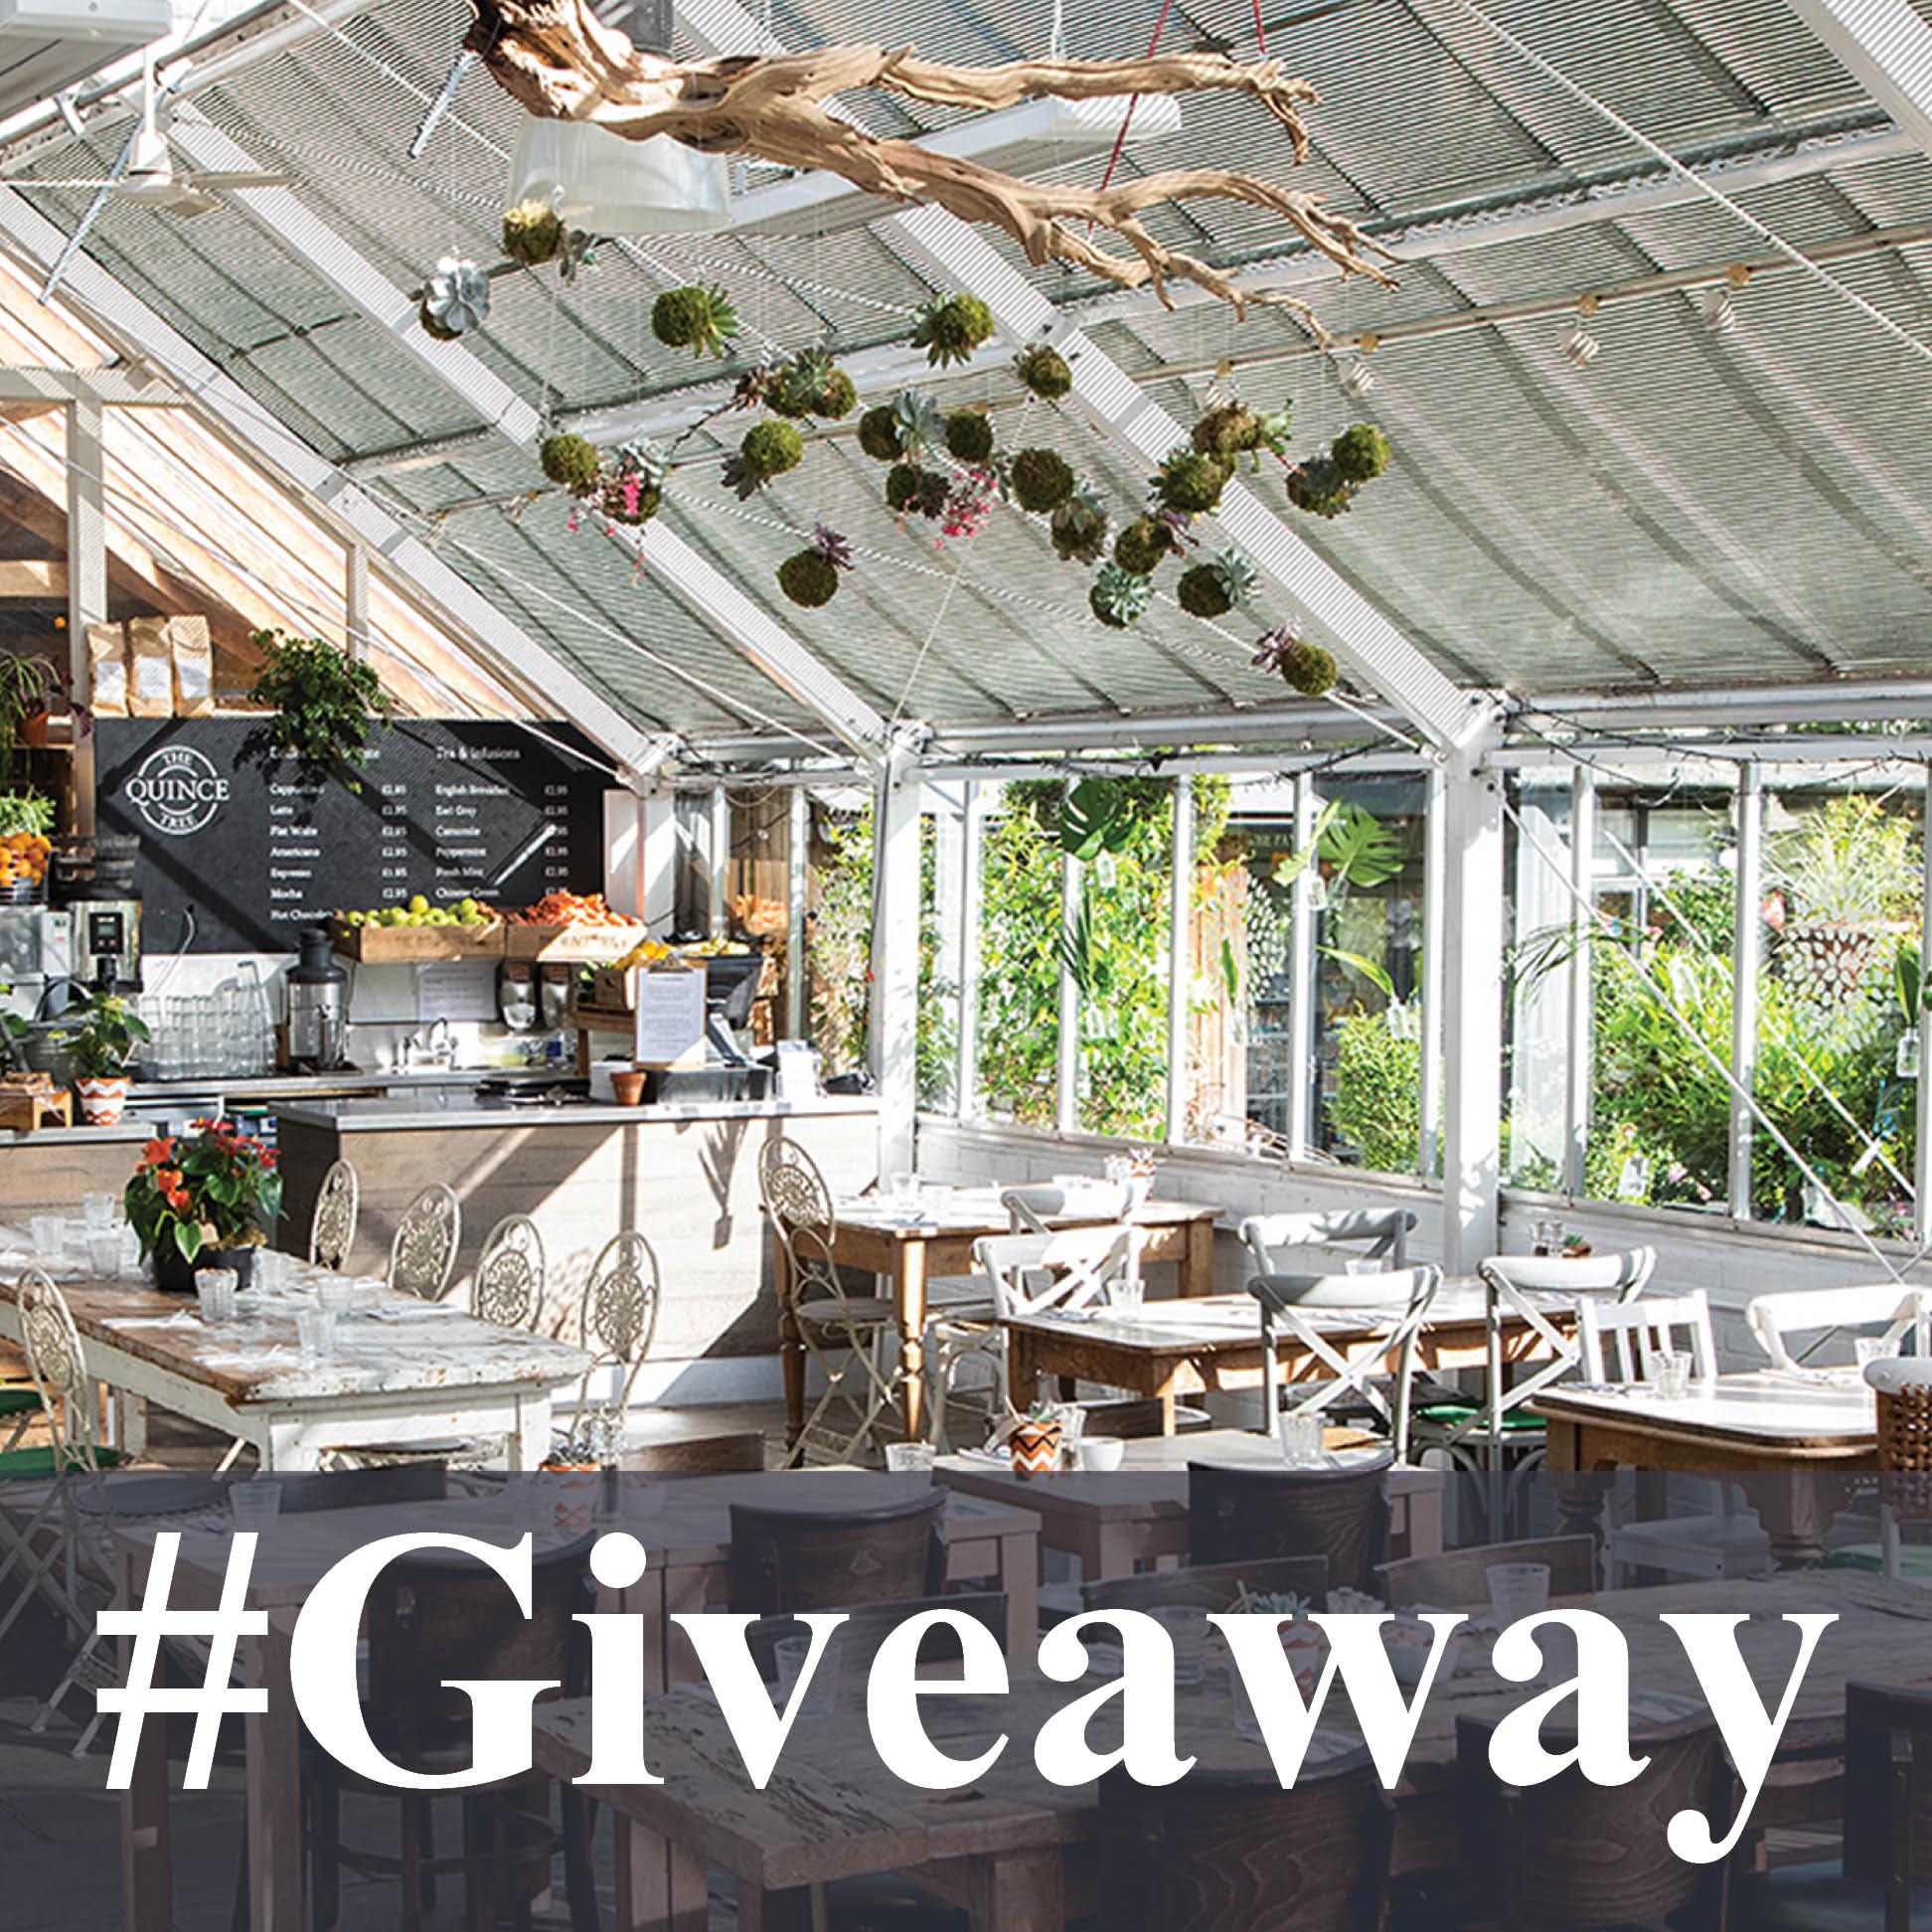 Instagram Supper Club #Giveaway